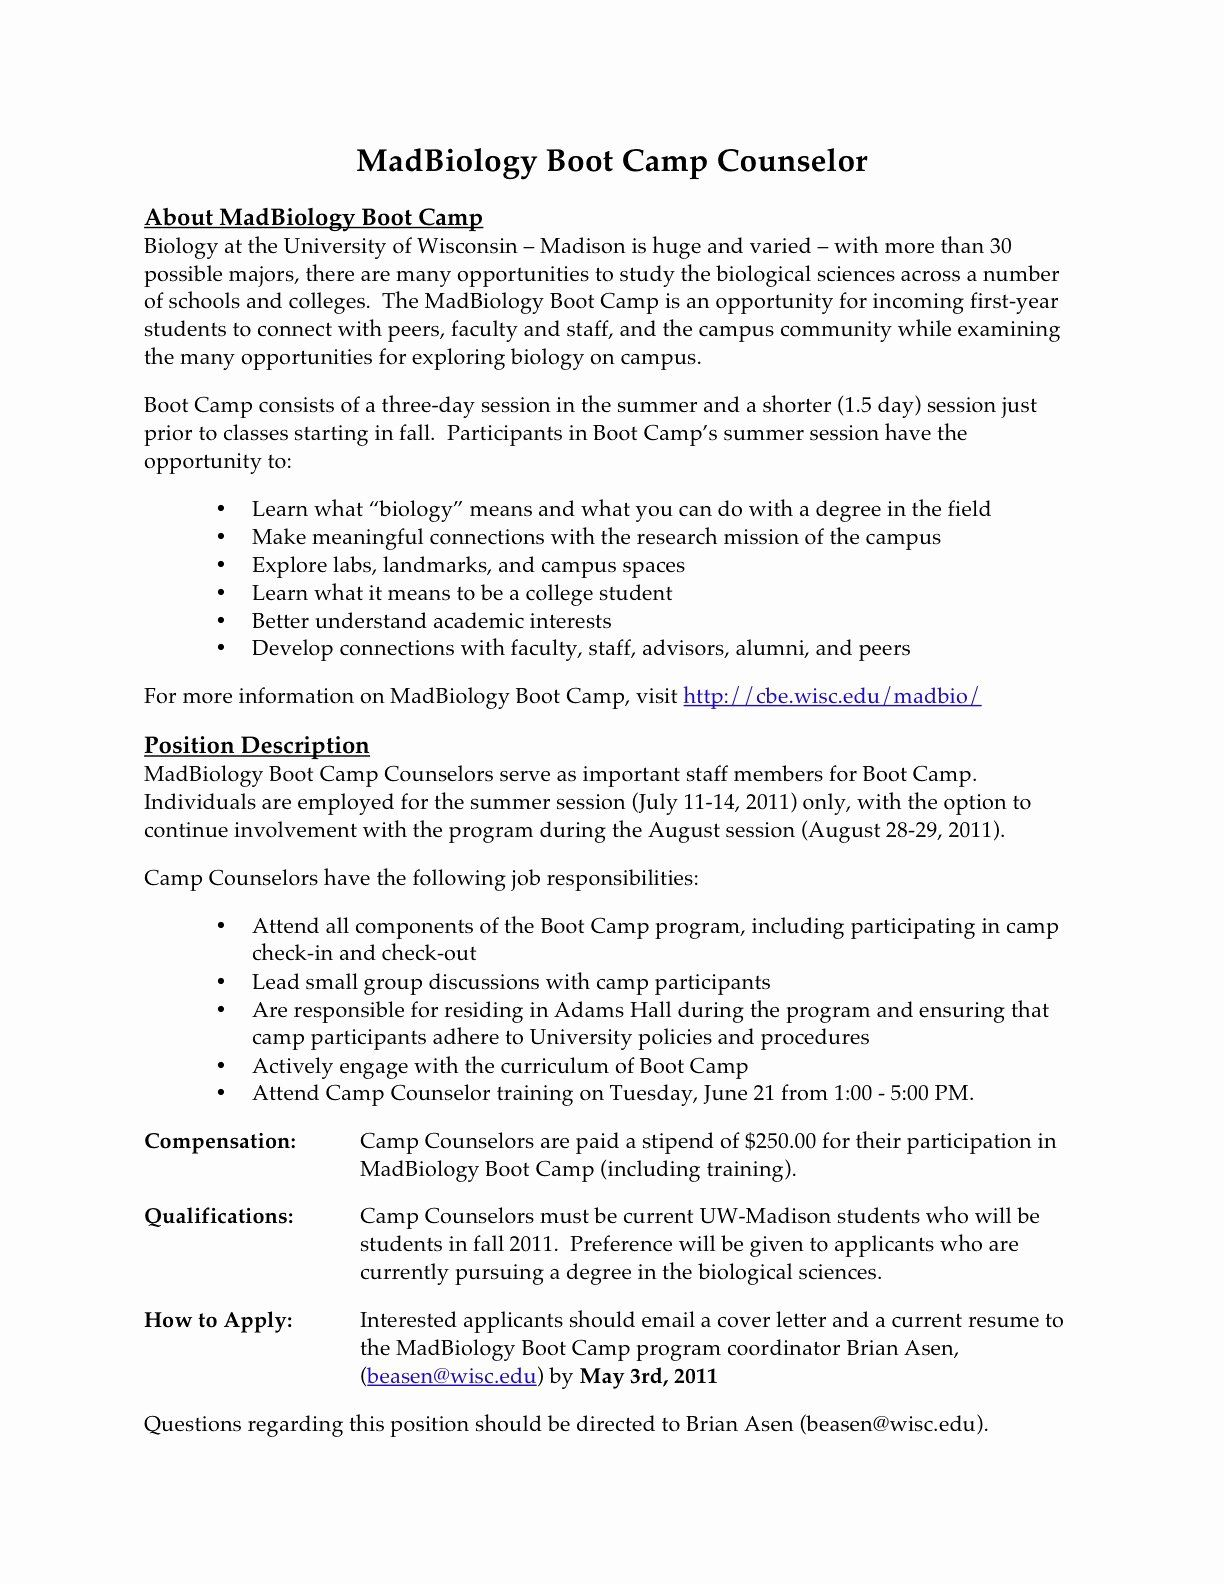 camp counselor resume job description